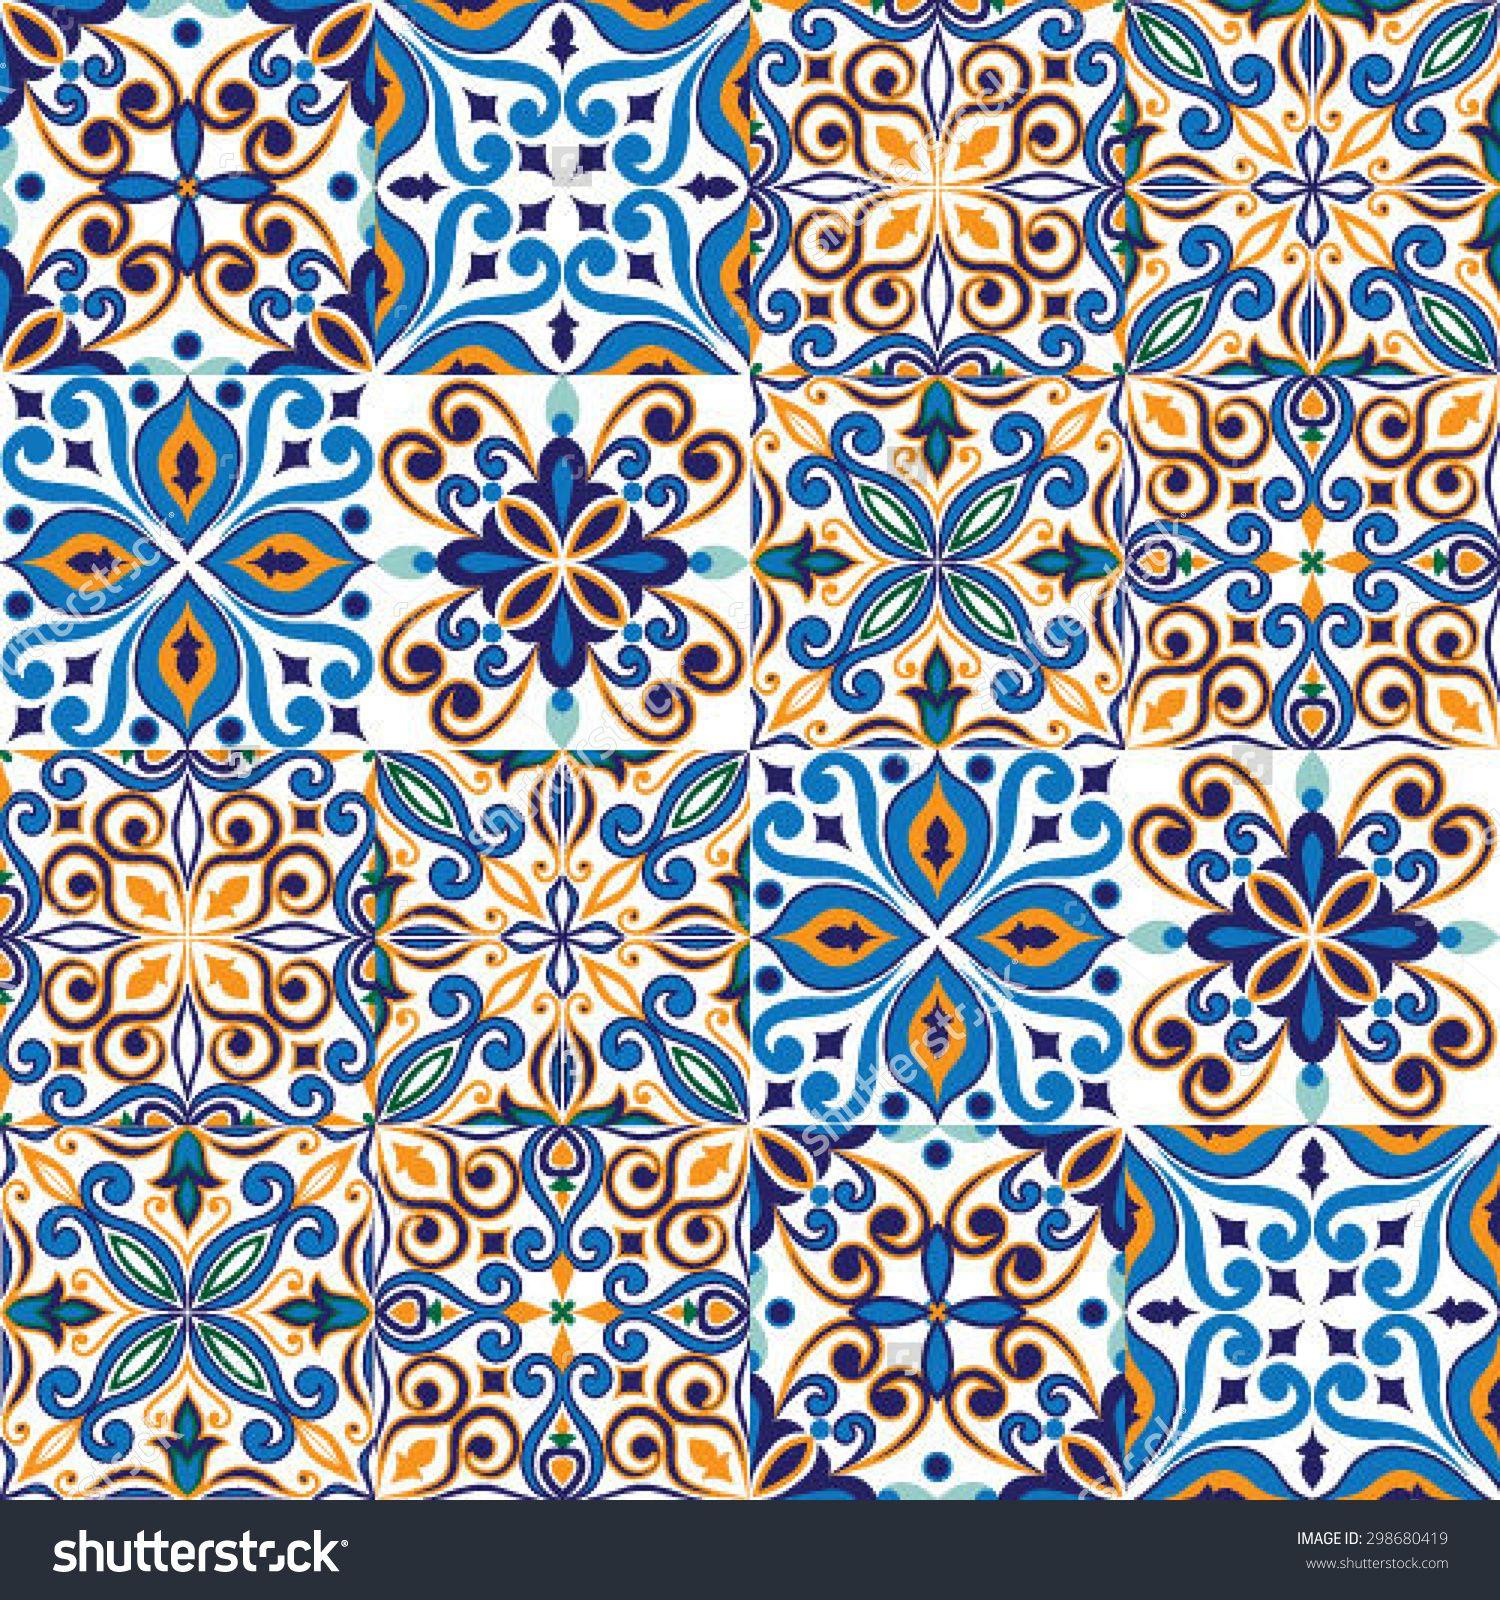 Vector of moroccan tile seamless pattern tile for design tile - Seamless Tile Background Blue White Orange Arabic Indian Patterns Mexican Talavera Tiles Stock Vector Illustration 298680419 Shutterstock